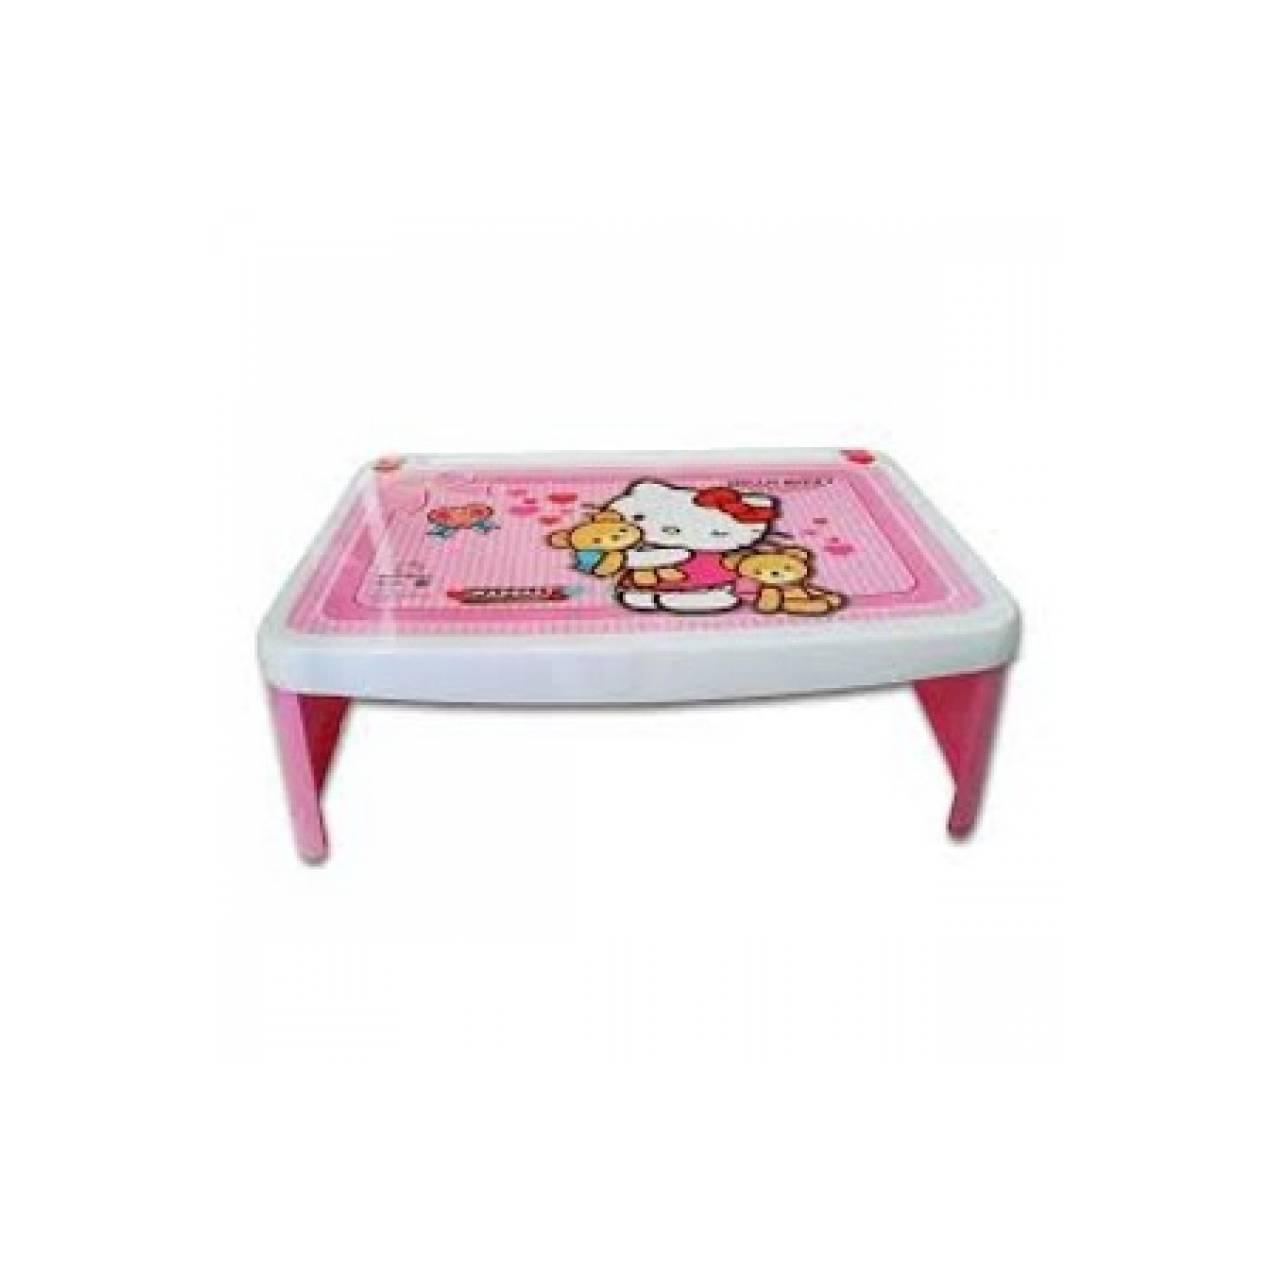 Meja Lipat Anak Lesehan Lap Desk Plastik Karakter Hello Kitty Napolly